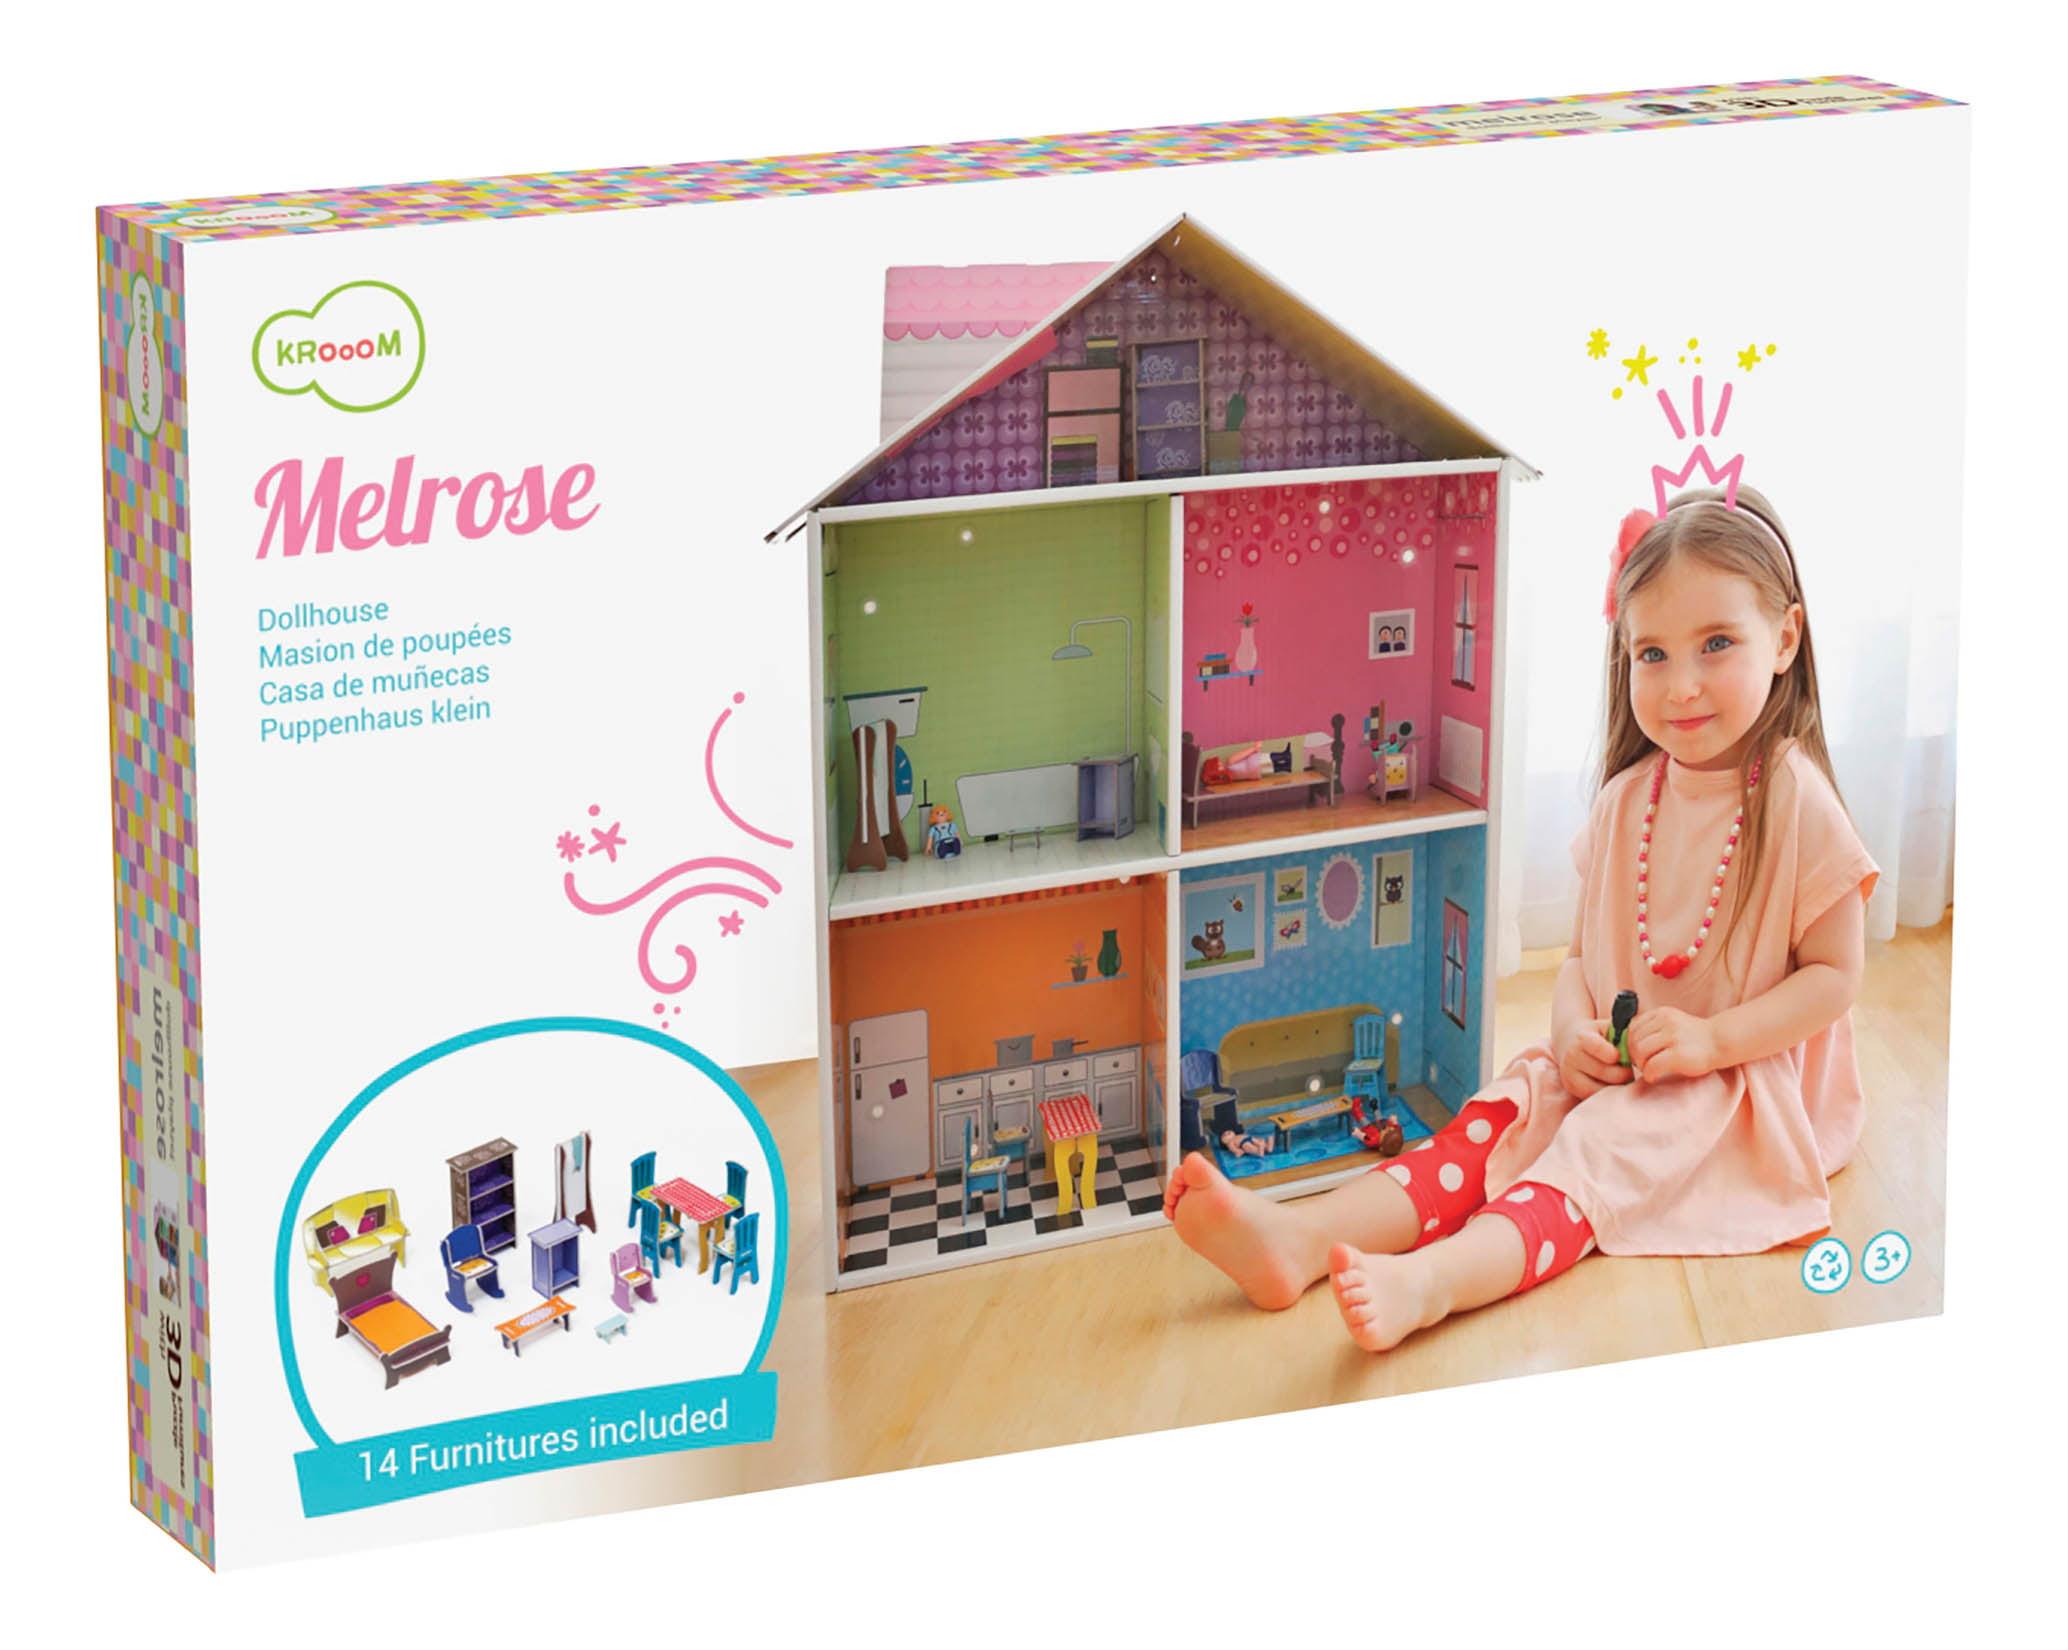 Krooom Melrose Dollhouse Playset Walmart Com Walmart Com